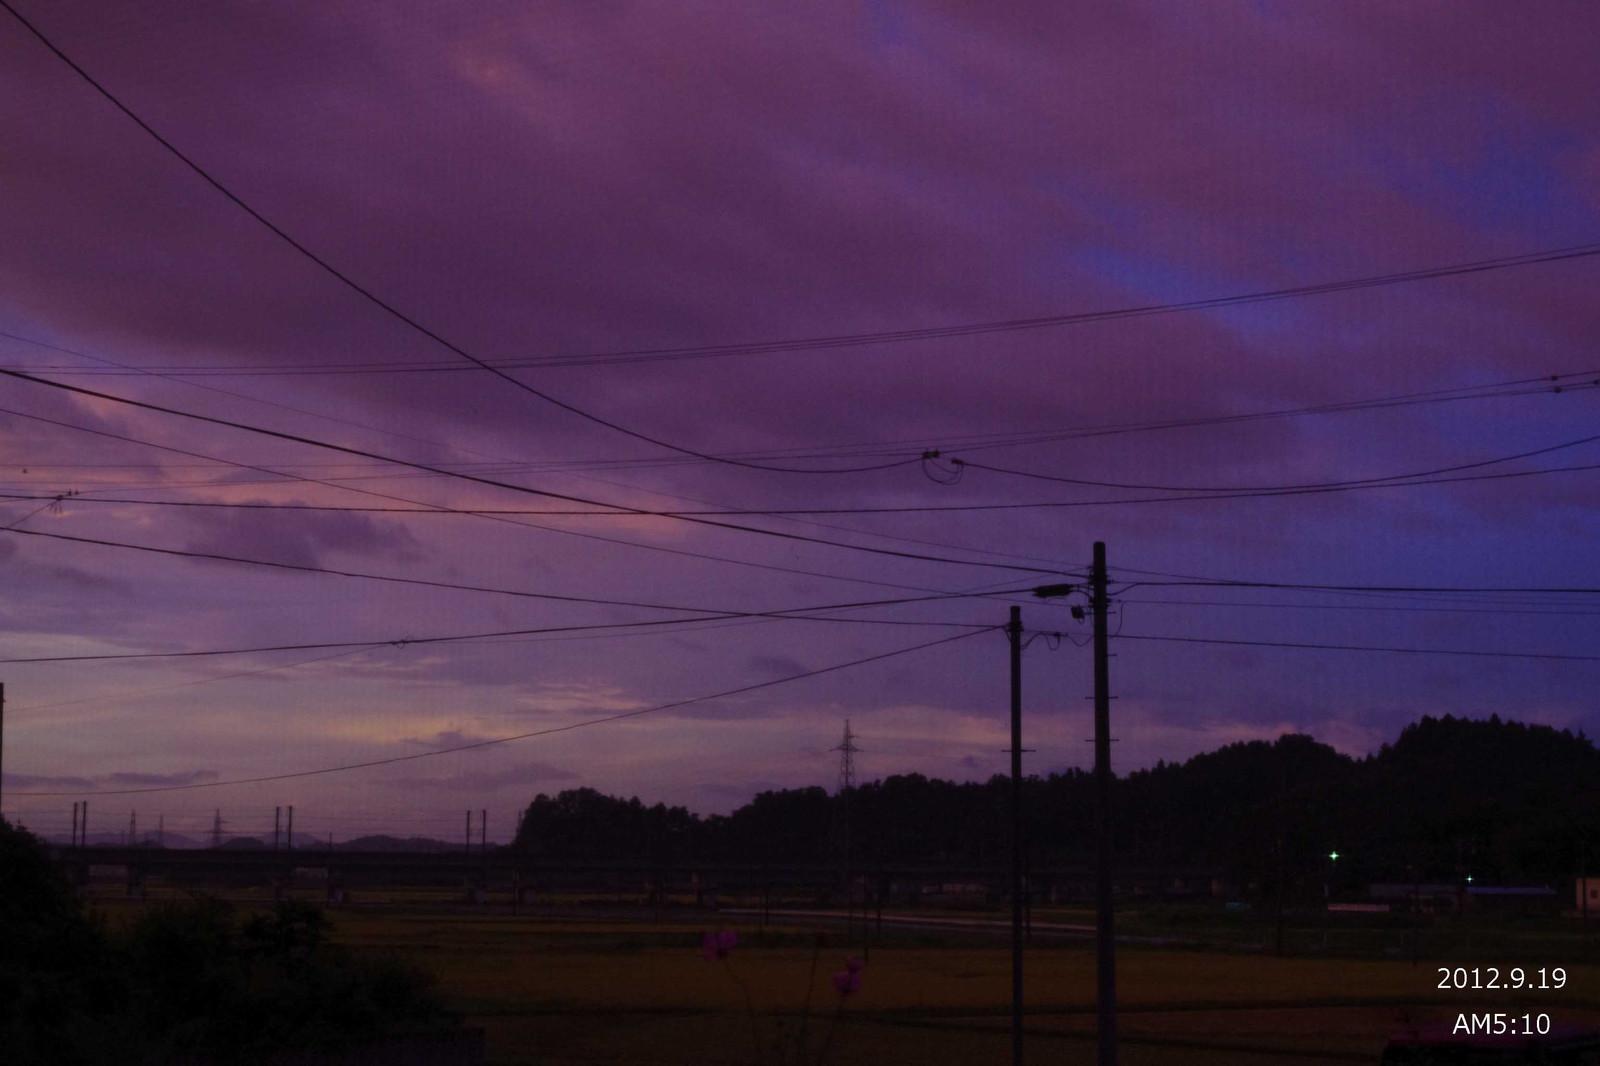 2012_09_19_9330_edited1